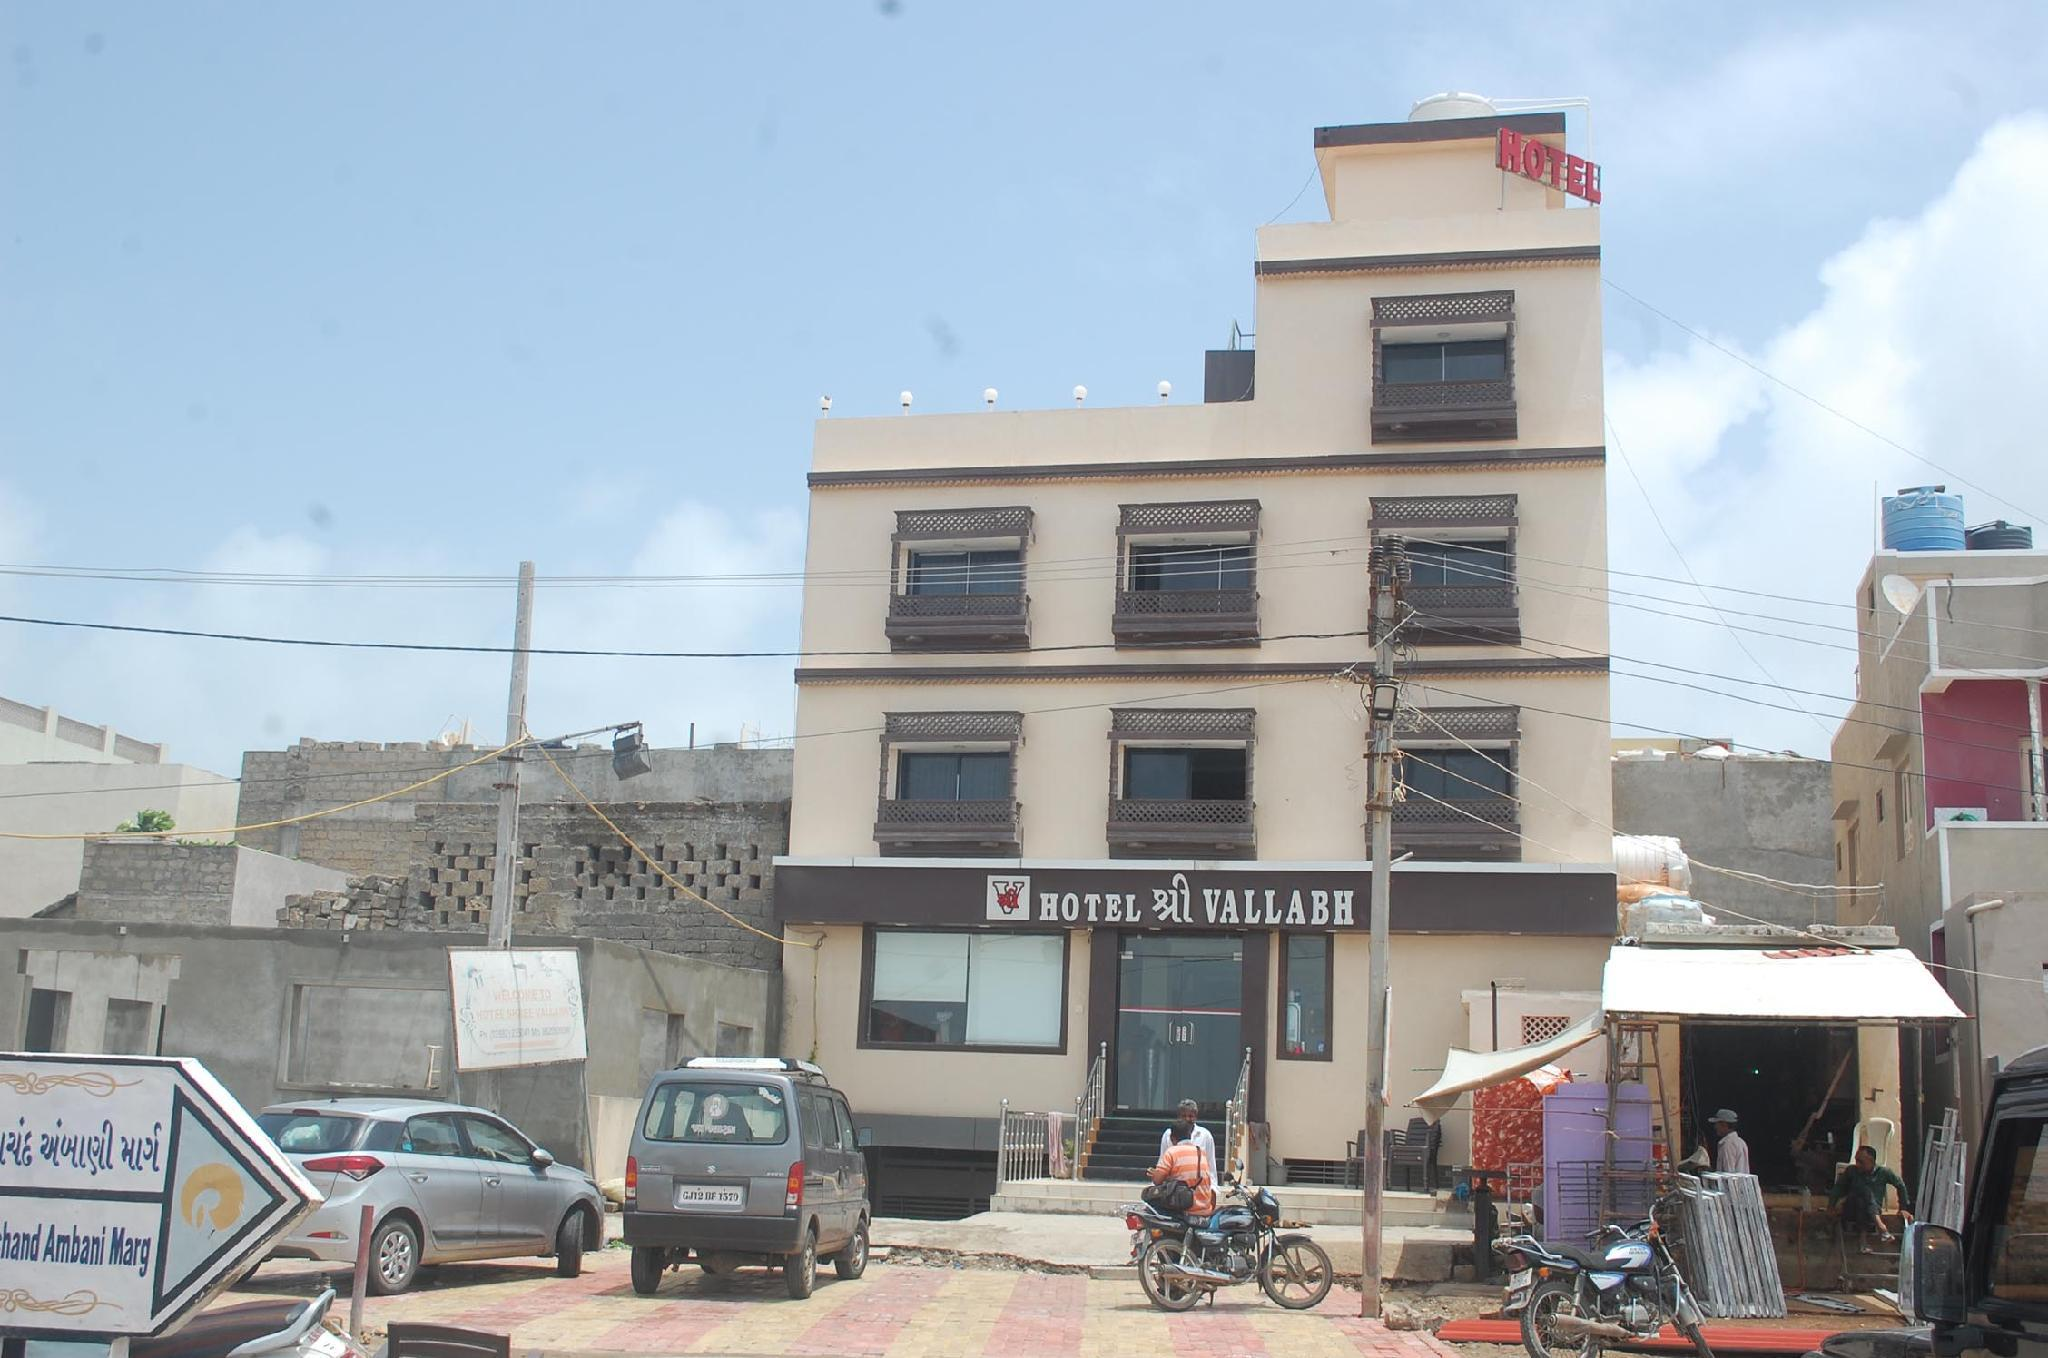 Hotel Shree Vallabh